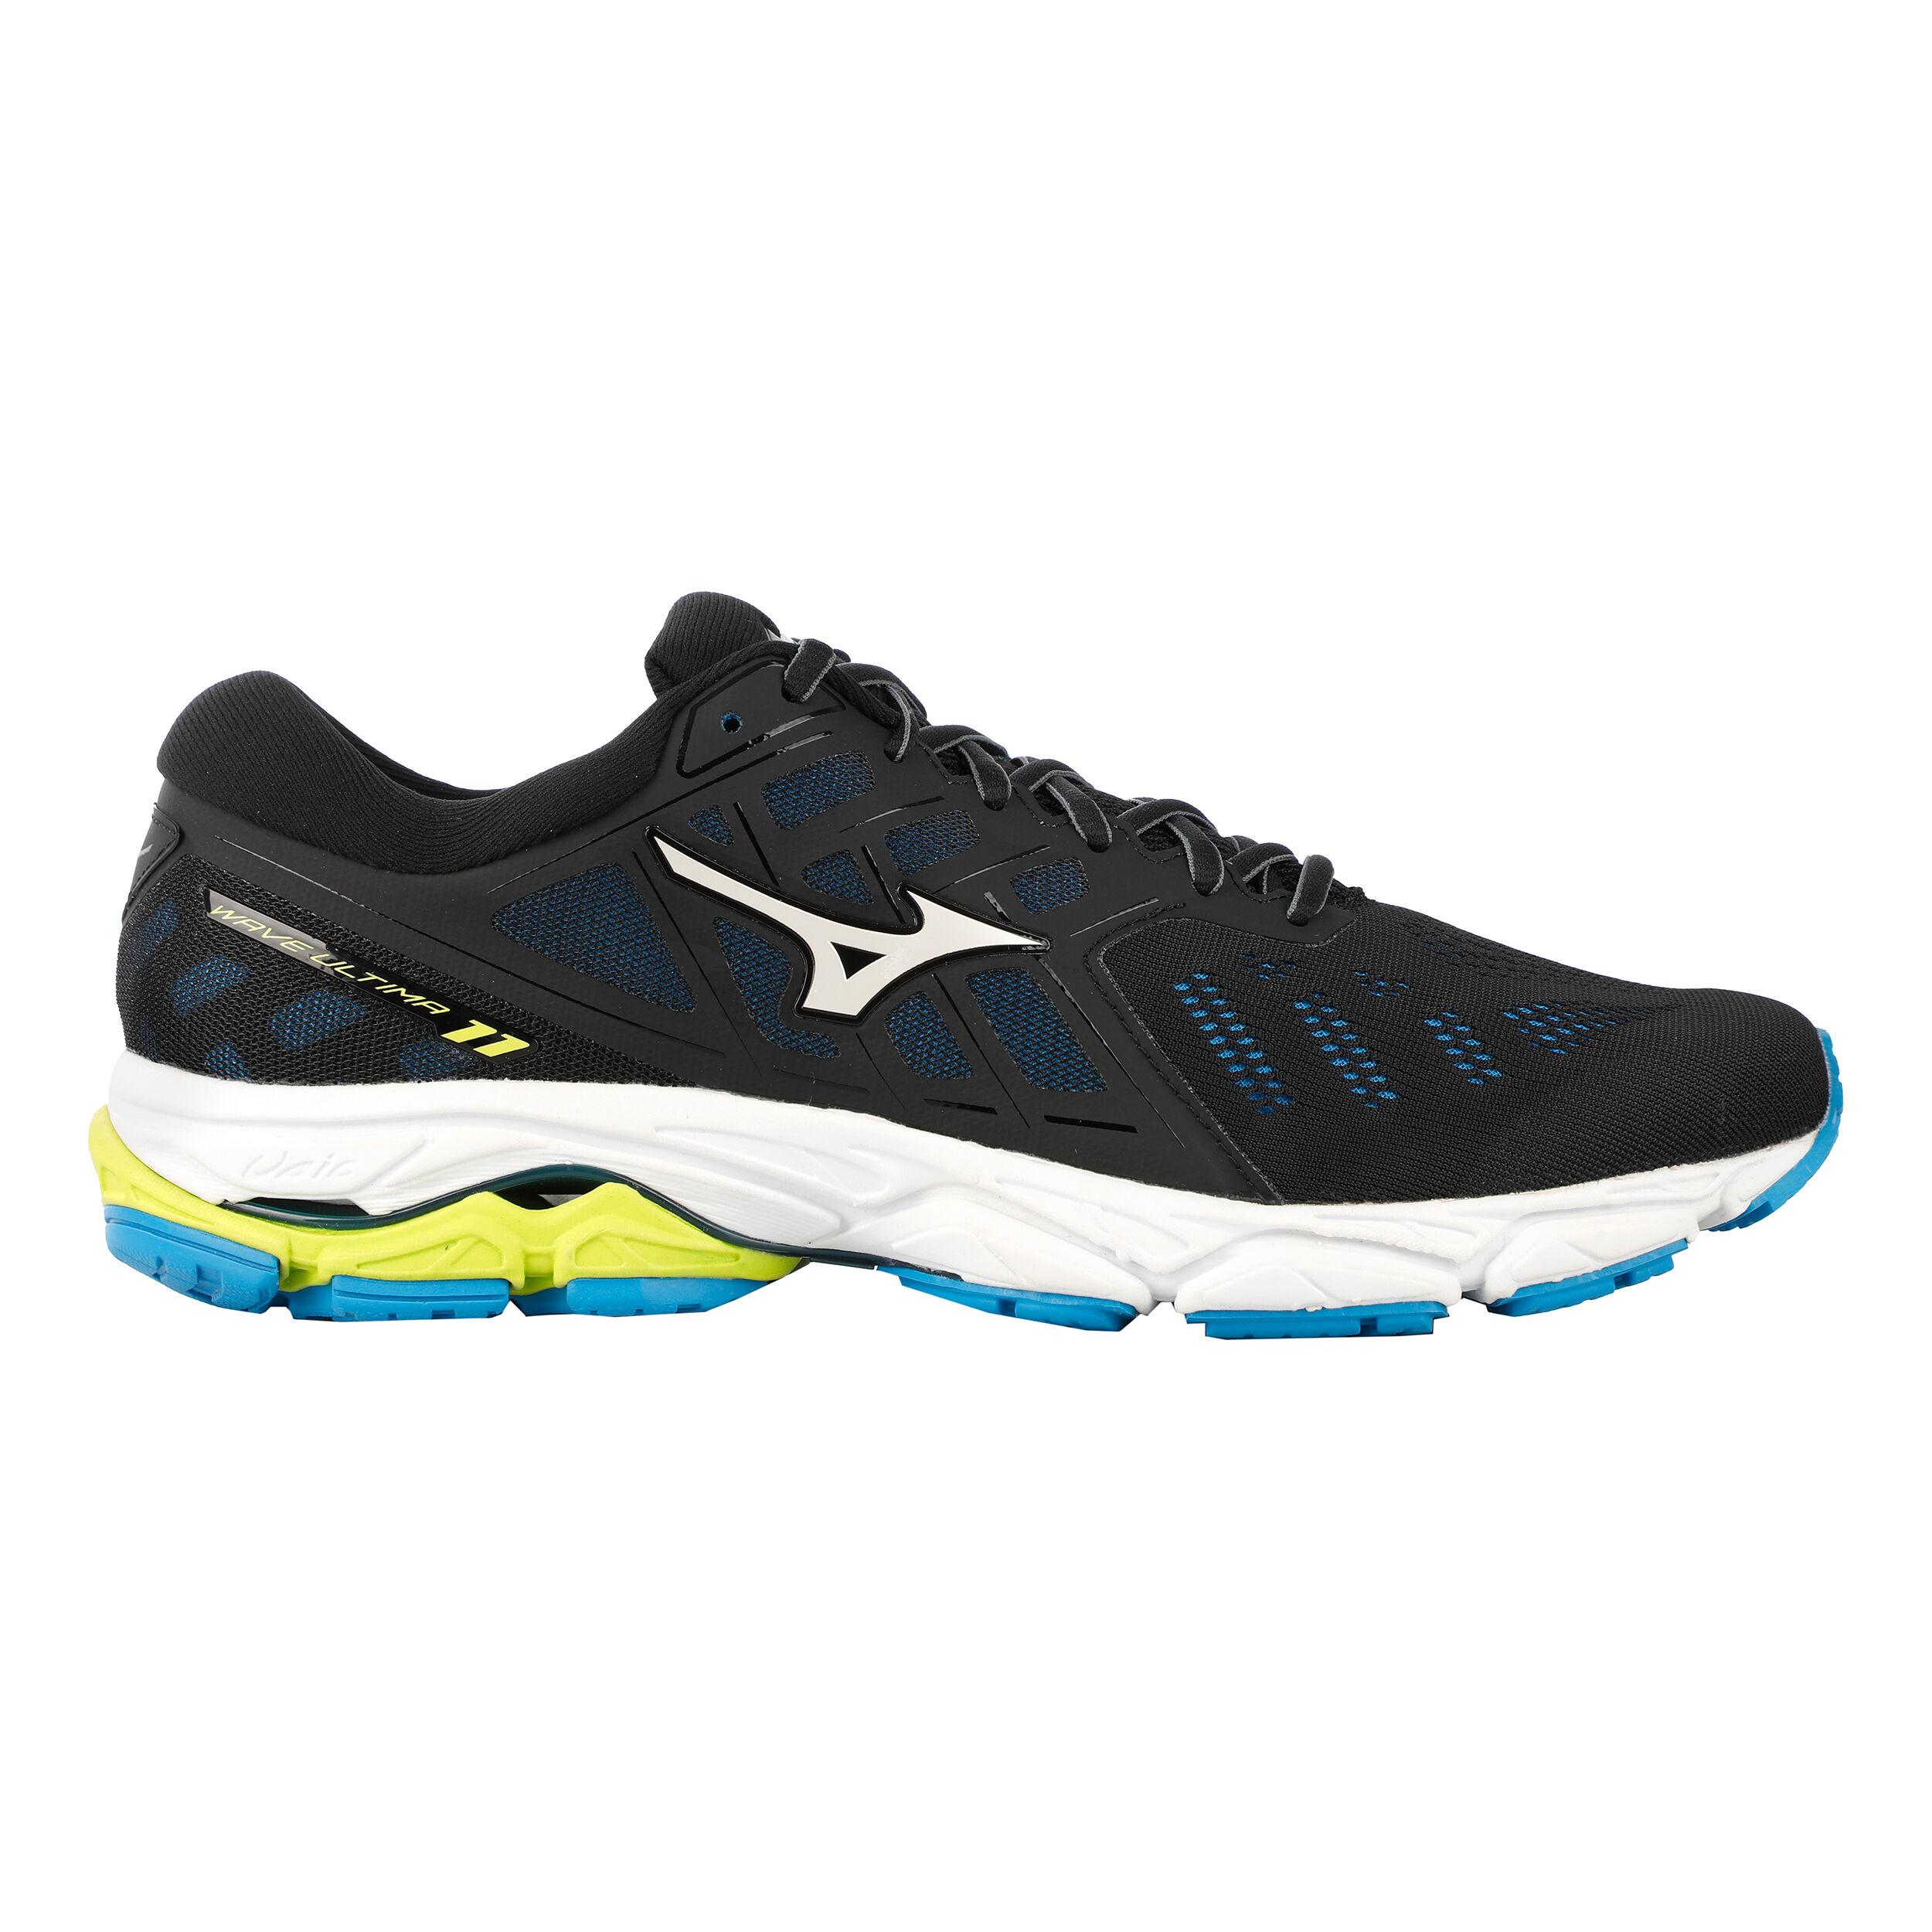 Mizuno Damen Wave Sonic 2 Turnschuhe Laufschuhe Sneaker Blau Laufen Jogging